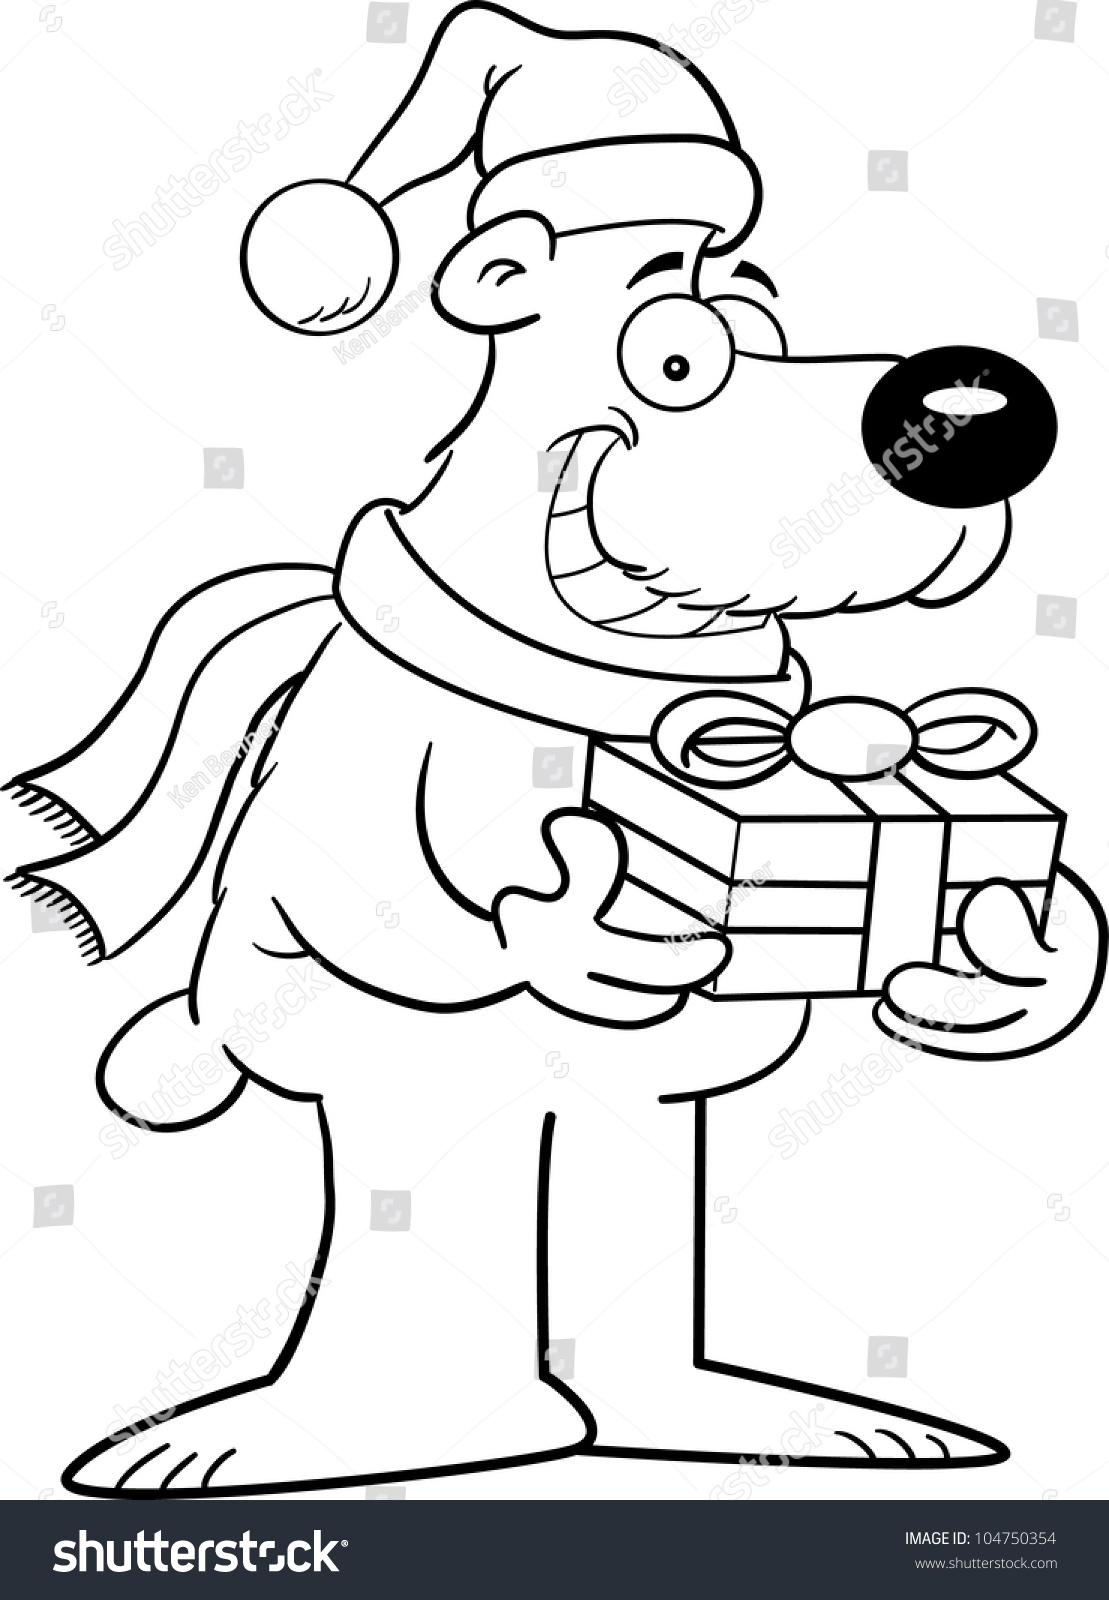 Cartoon Illustration Polar Bear Coloring Page Stock Illustration ...